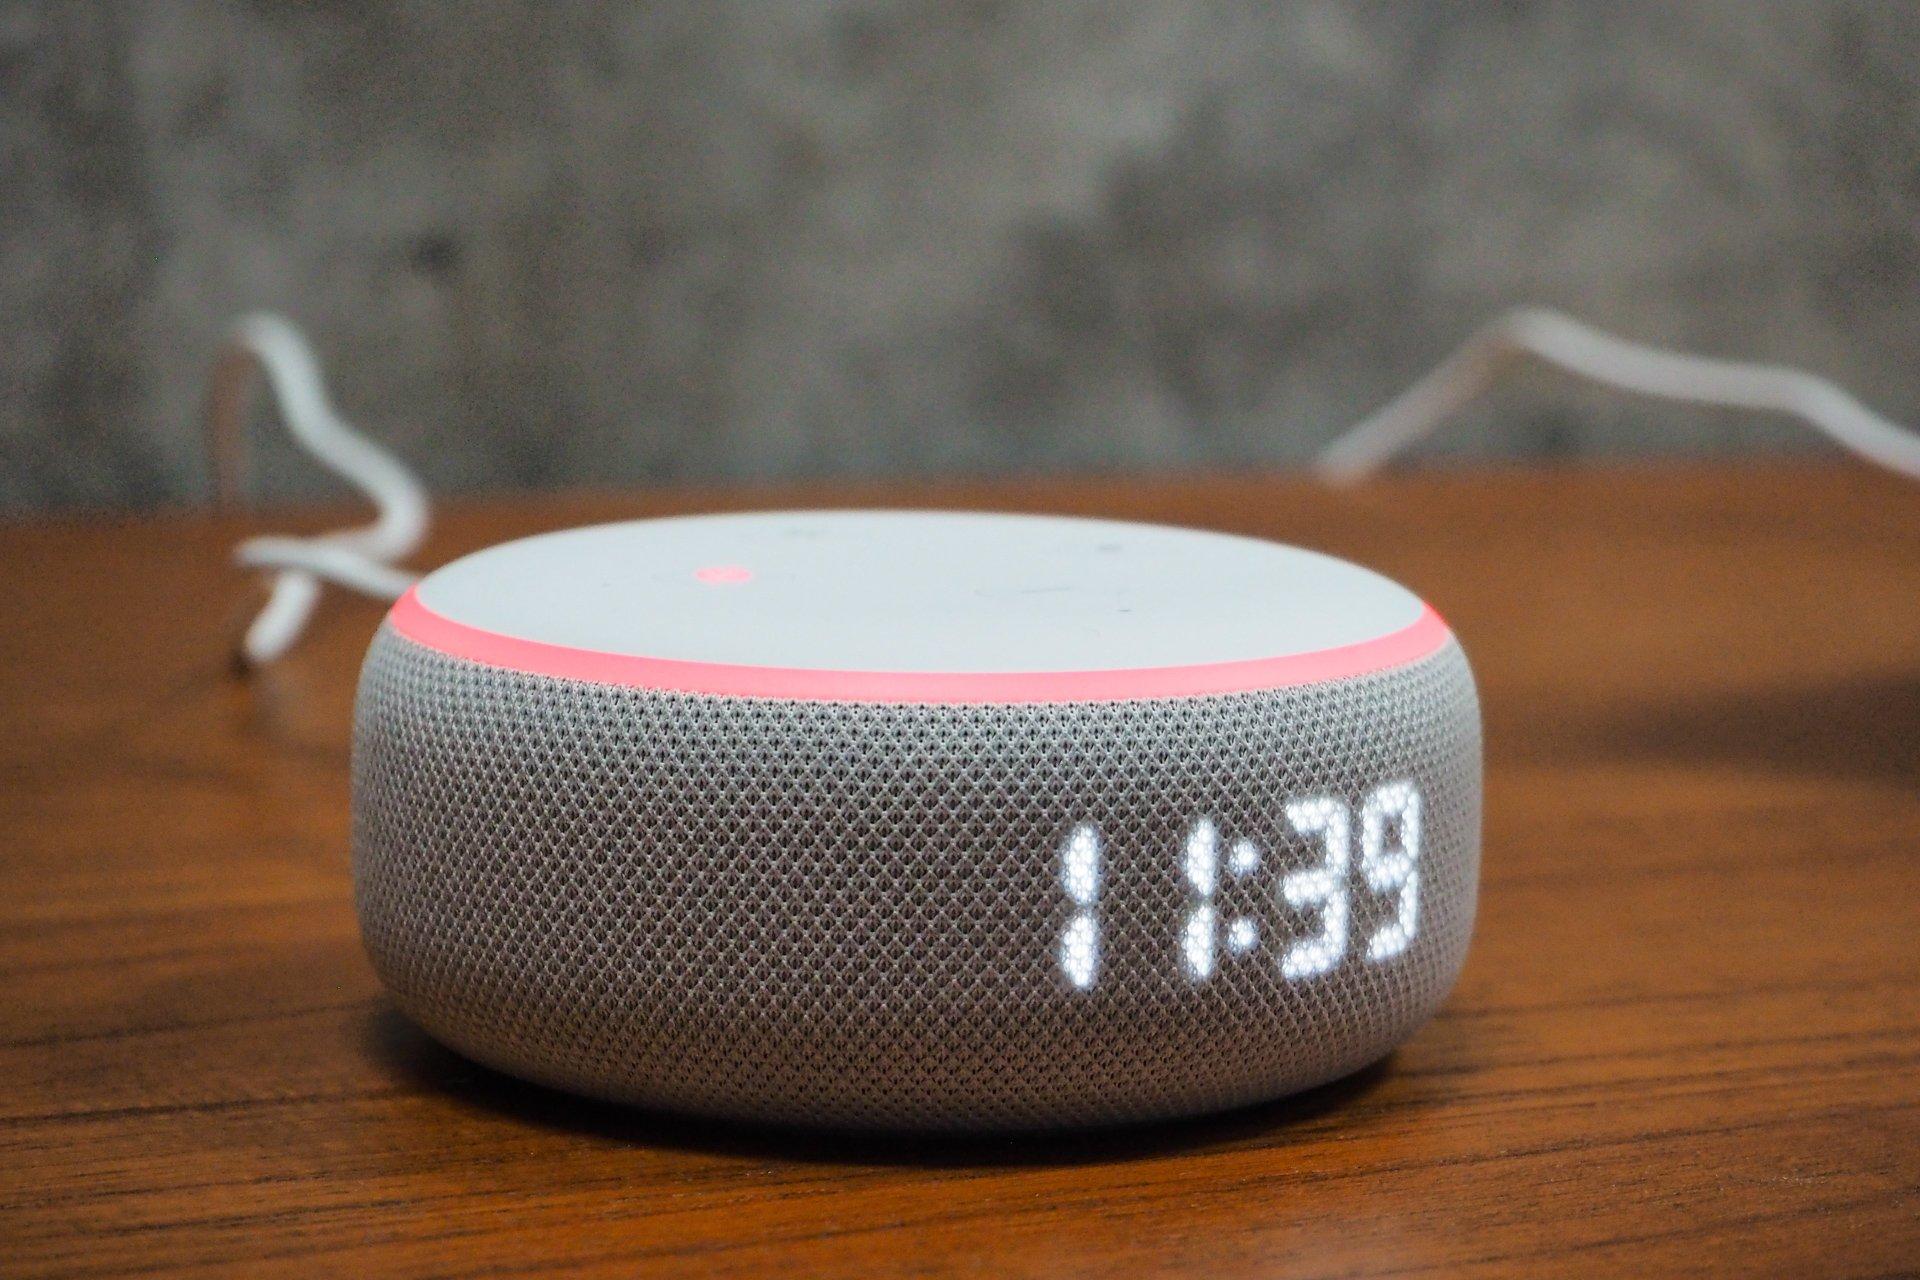 Google Meet Raises Alarm for Unexpected Device Echo